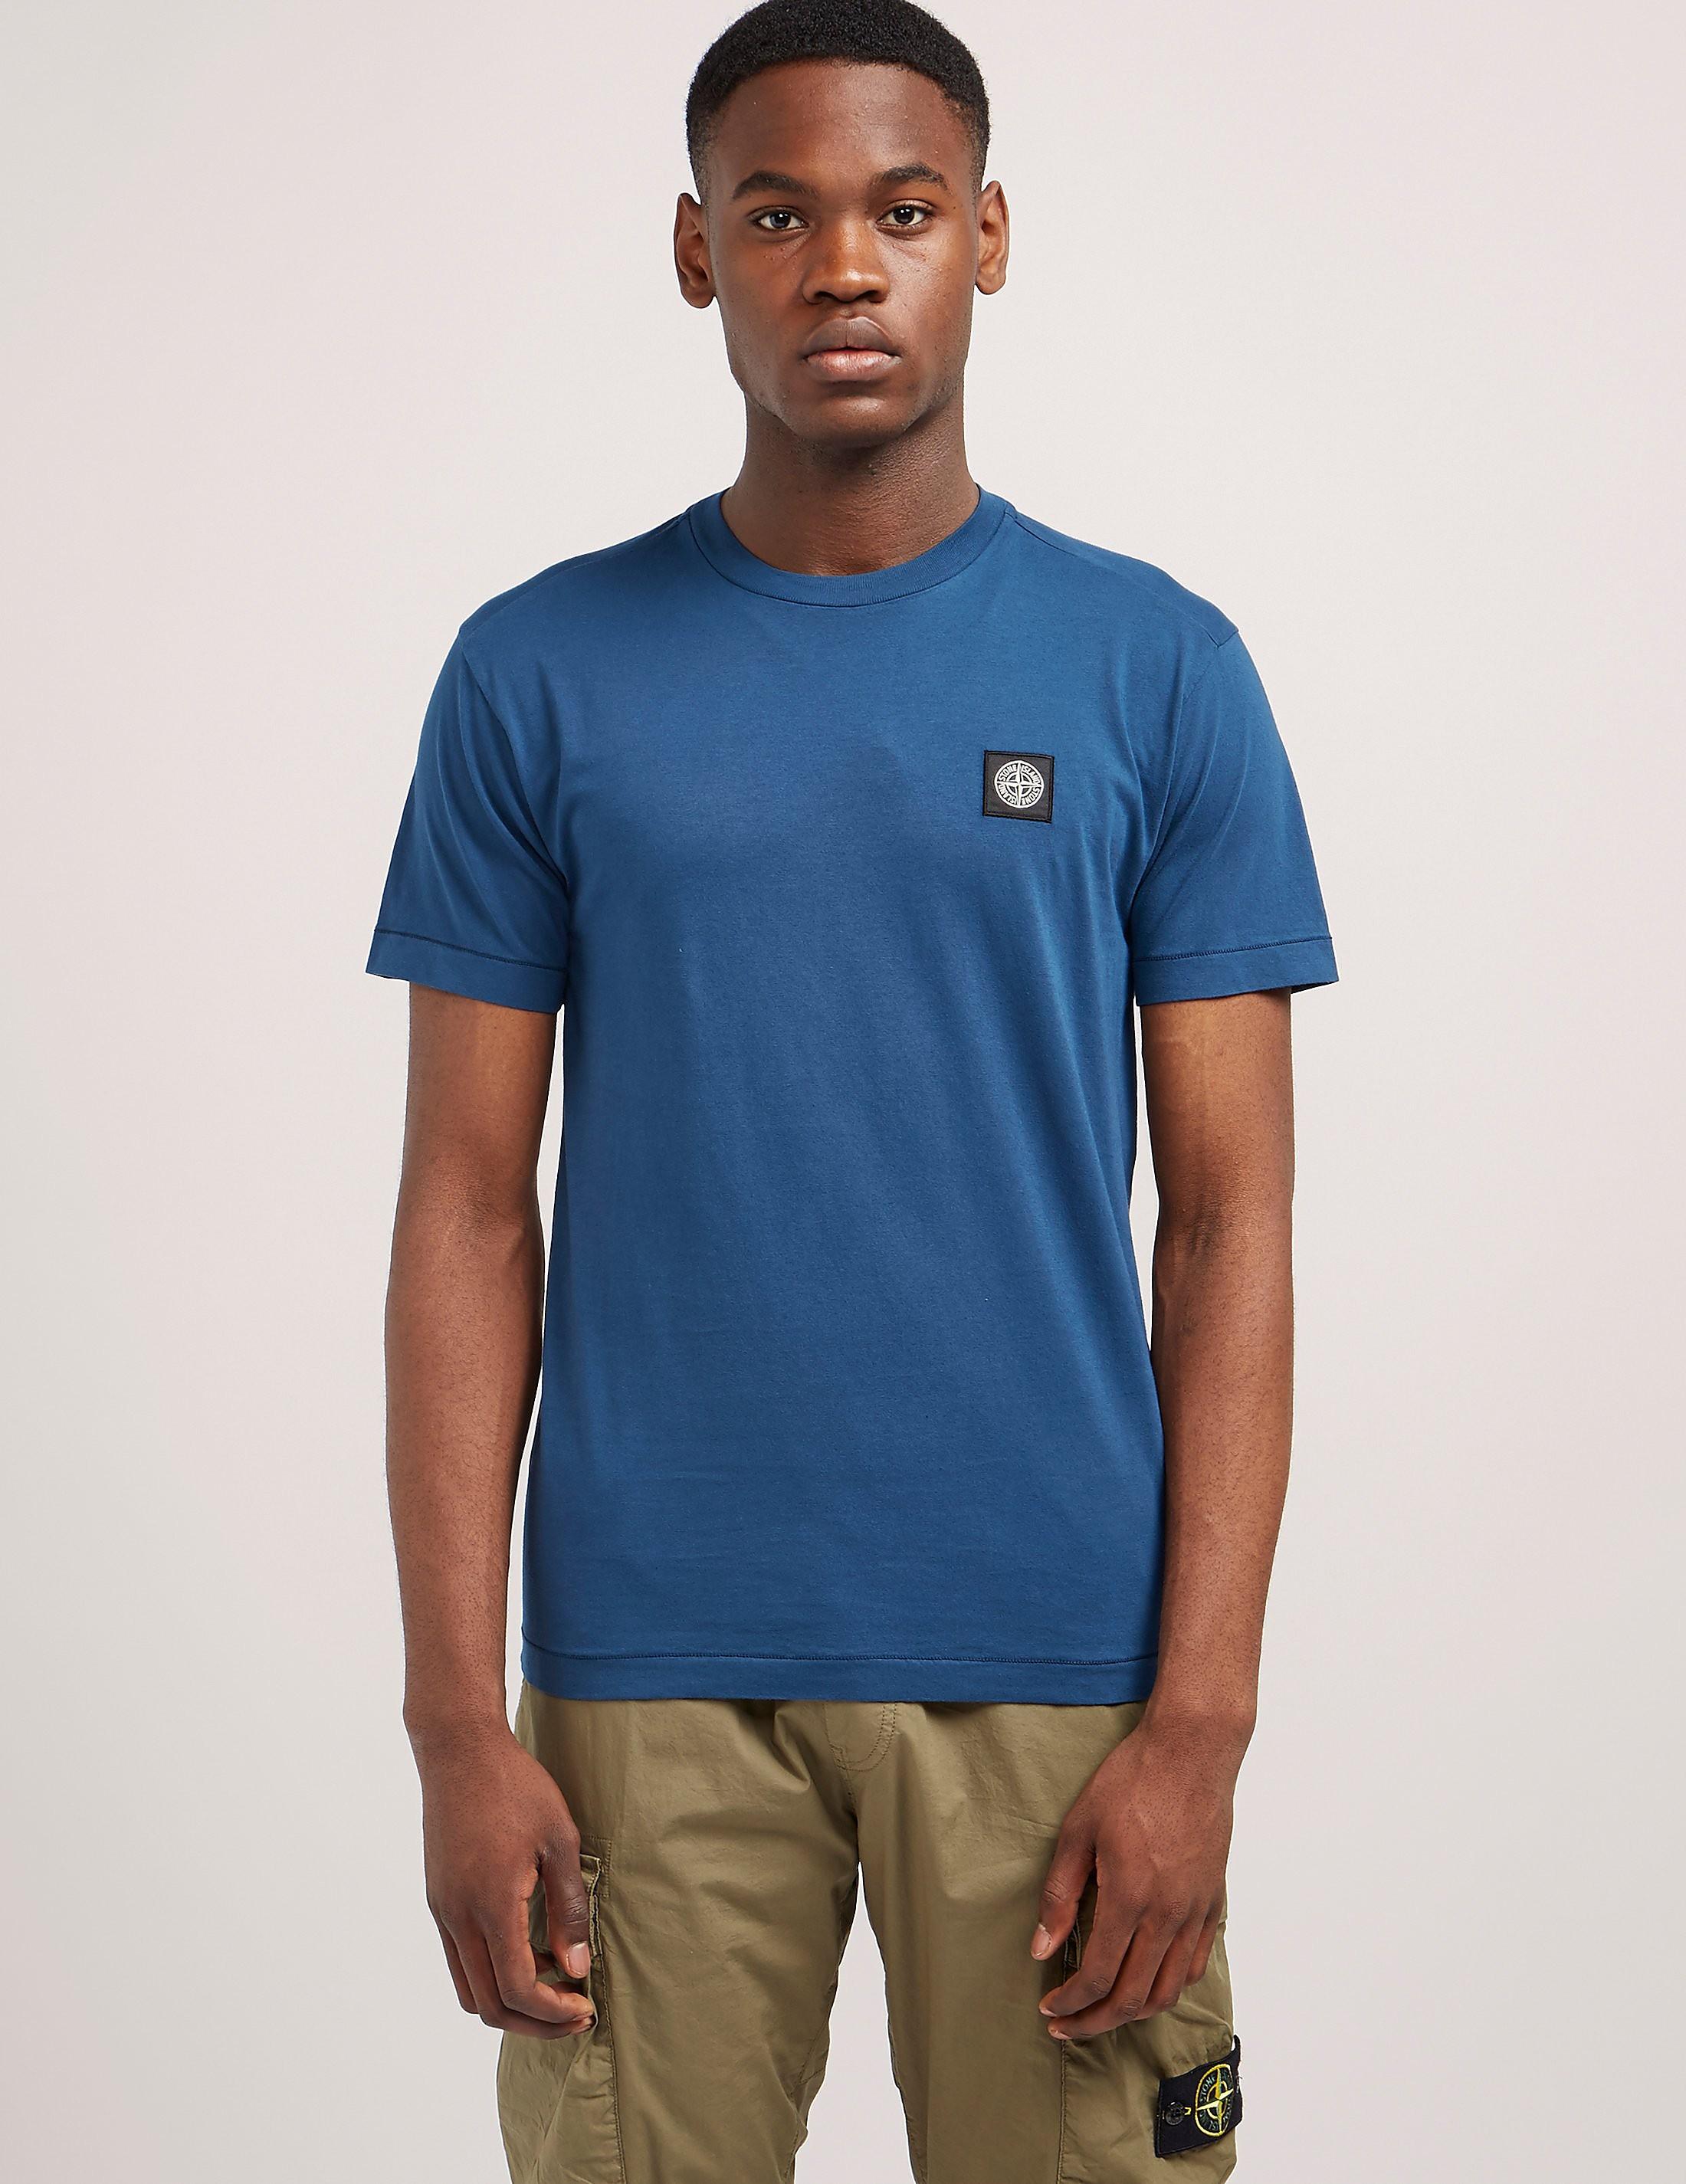 Stone Island Short Sleeve Patch T-Shirt